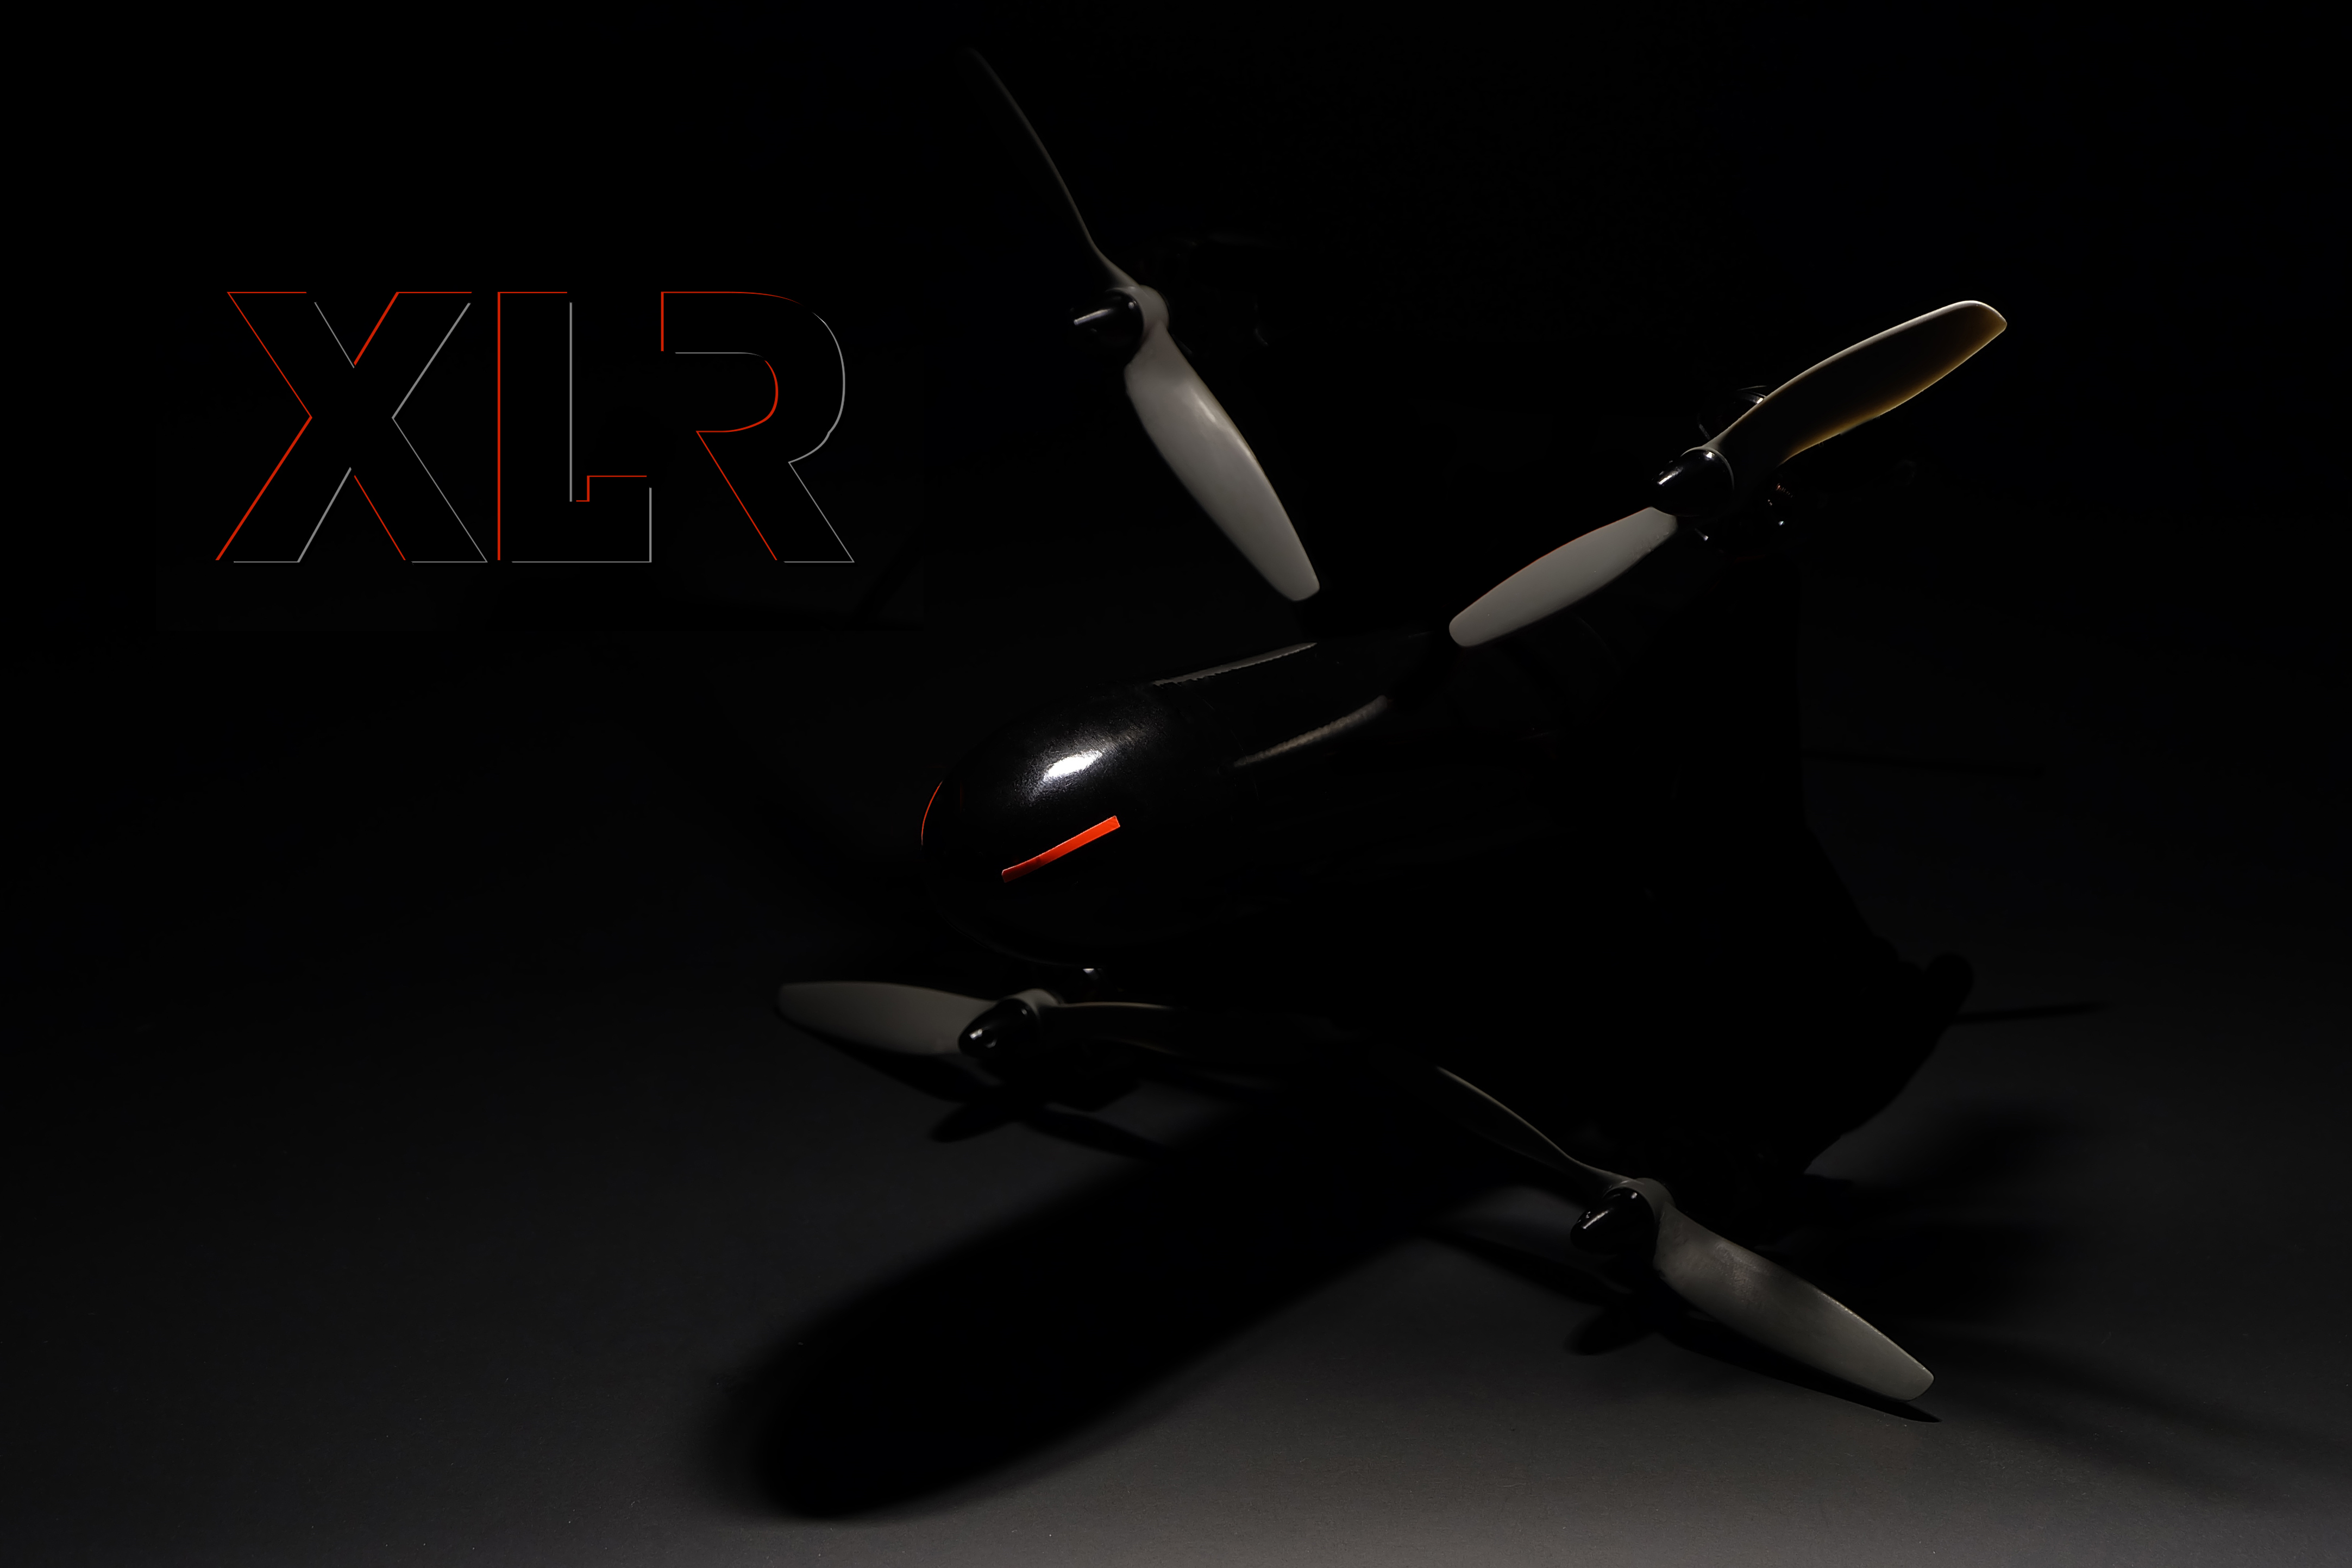 FPV multirotor speed record XLR-1